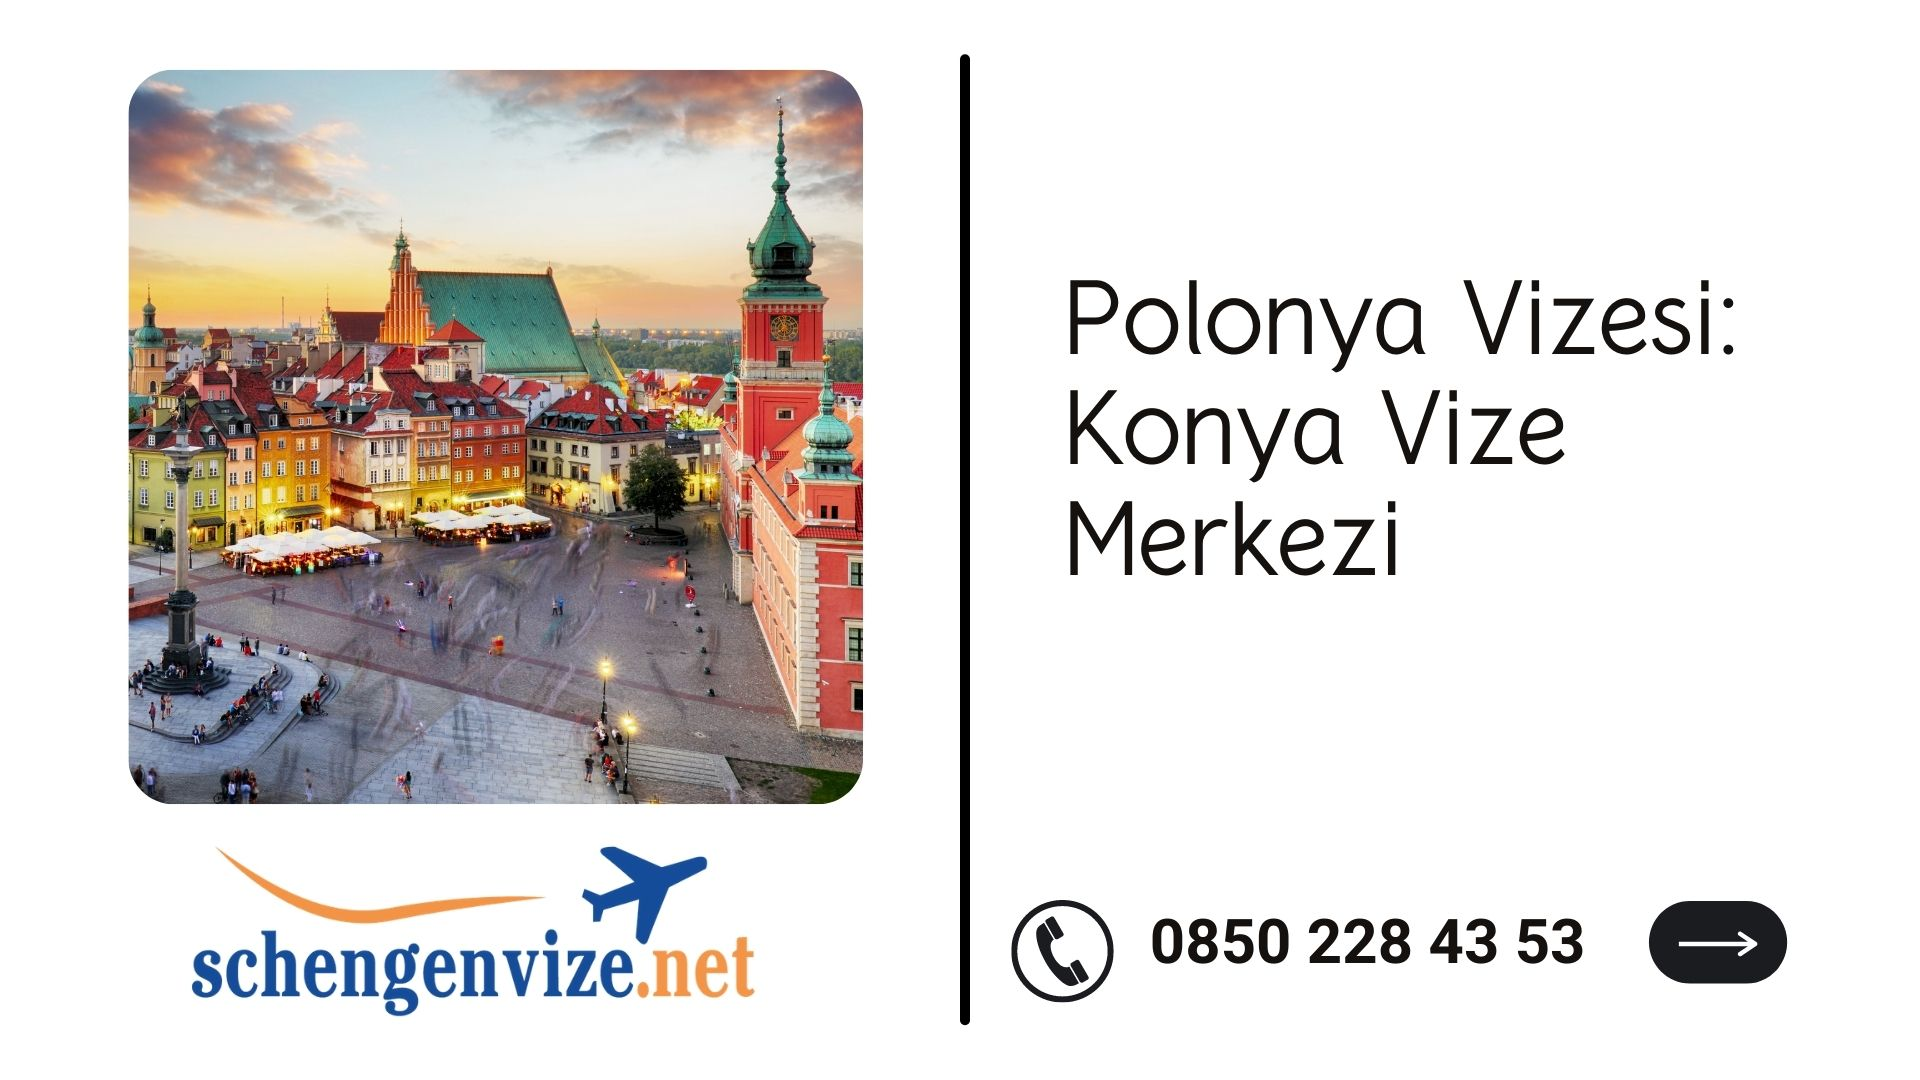 Polonya Vizesi: Konya Vize Merkezi